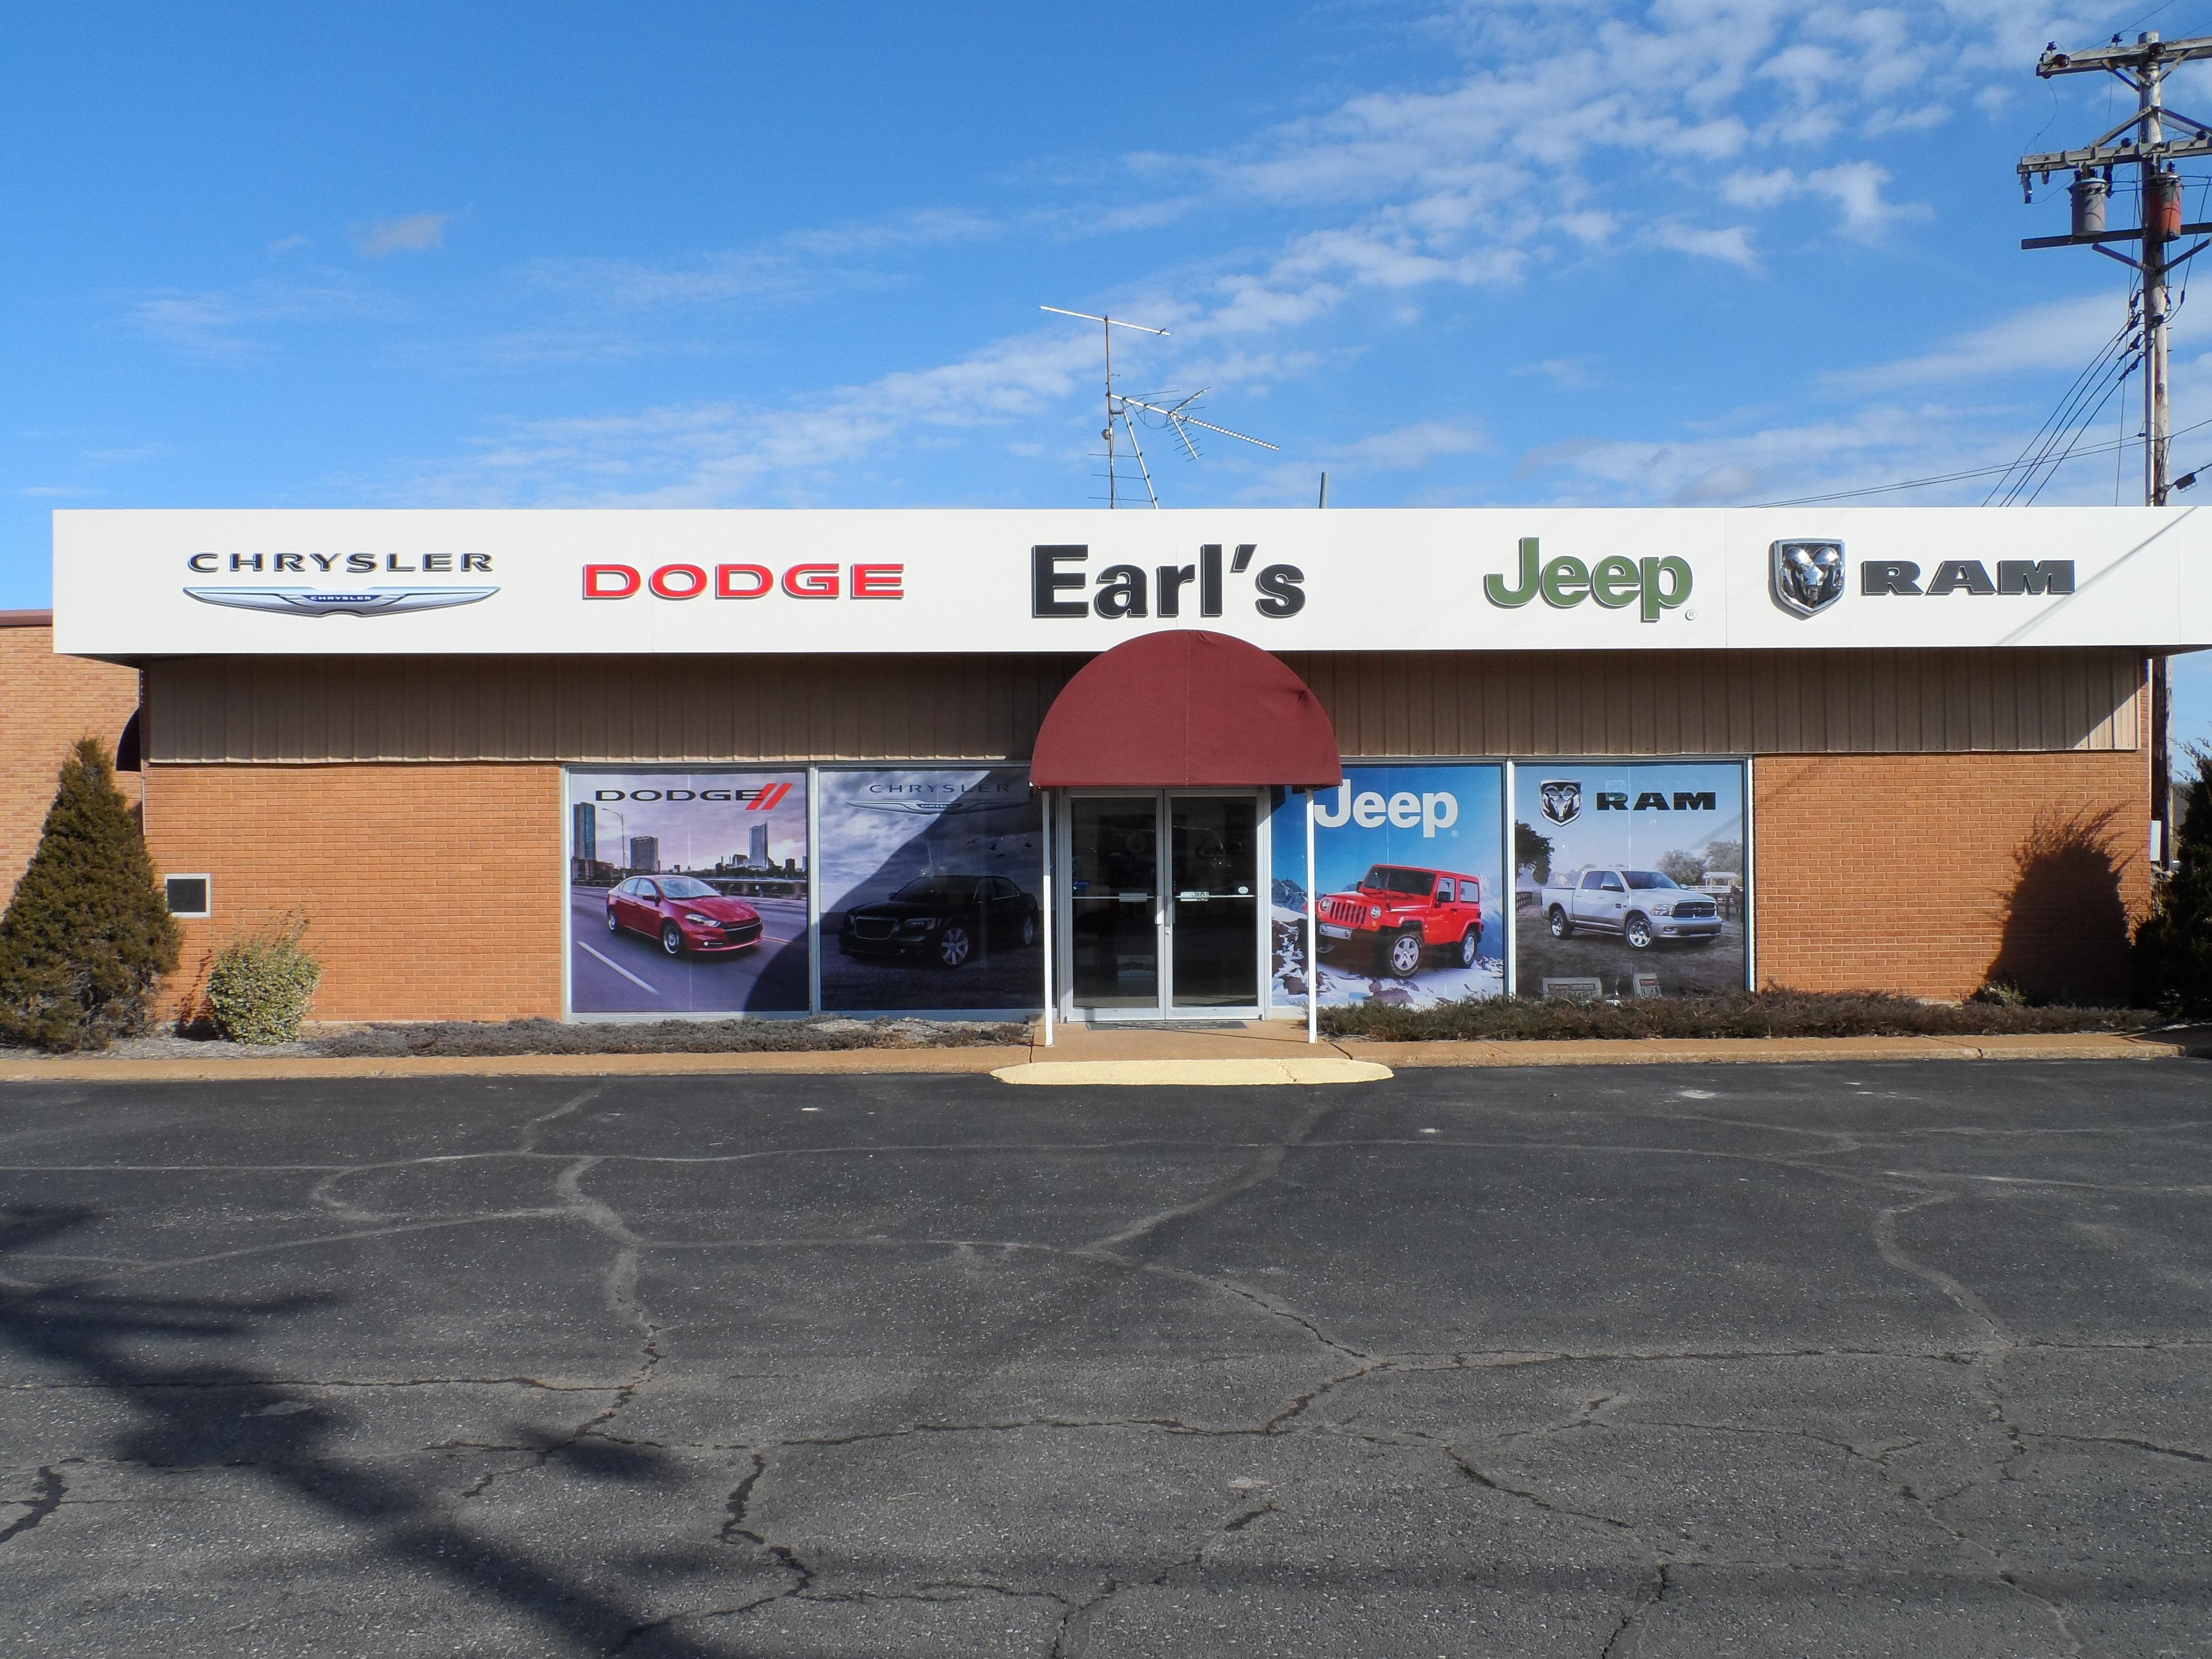 Earl's Dodge Chrysler Jeep Ram